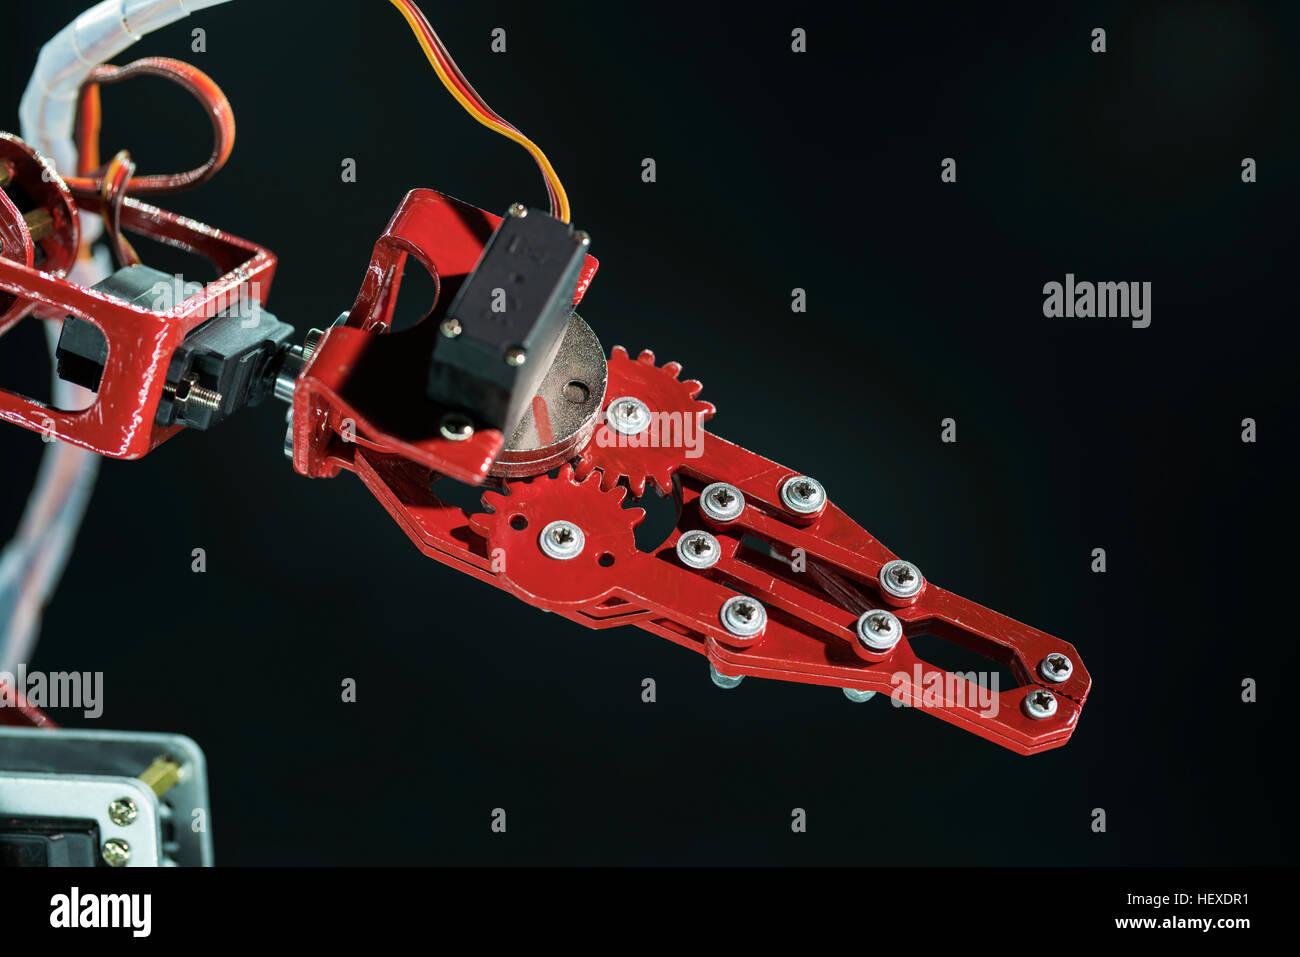 Robotic hand. - Stock Image